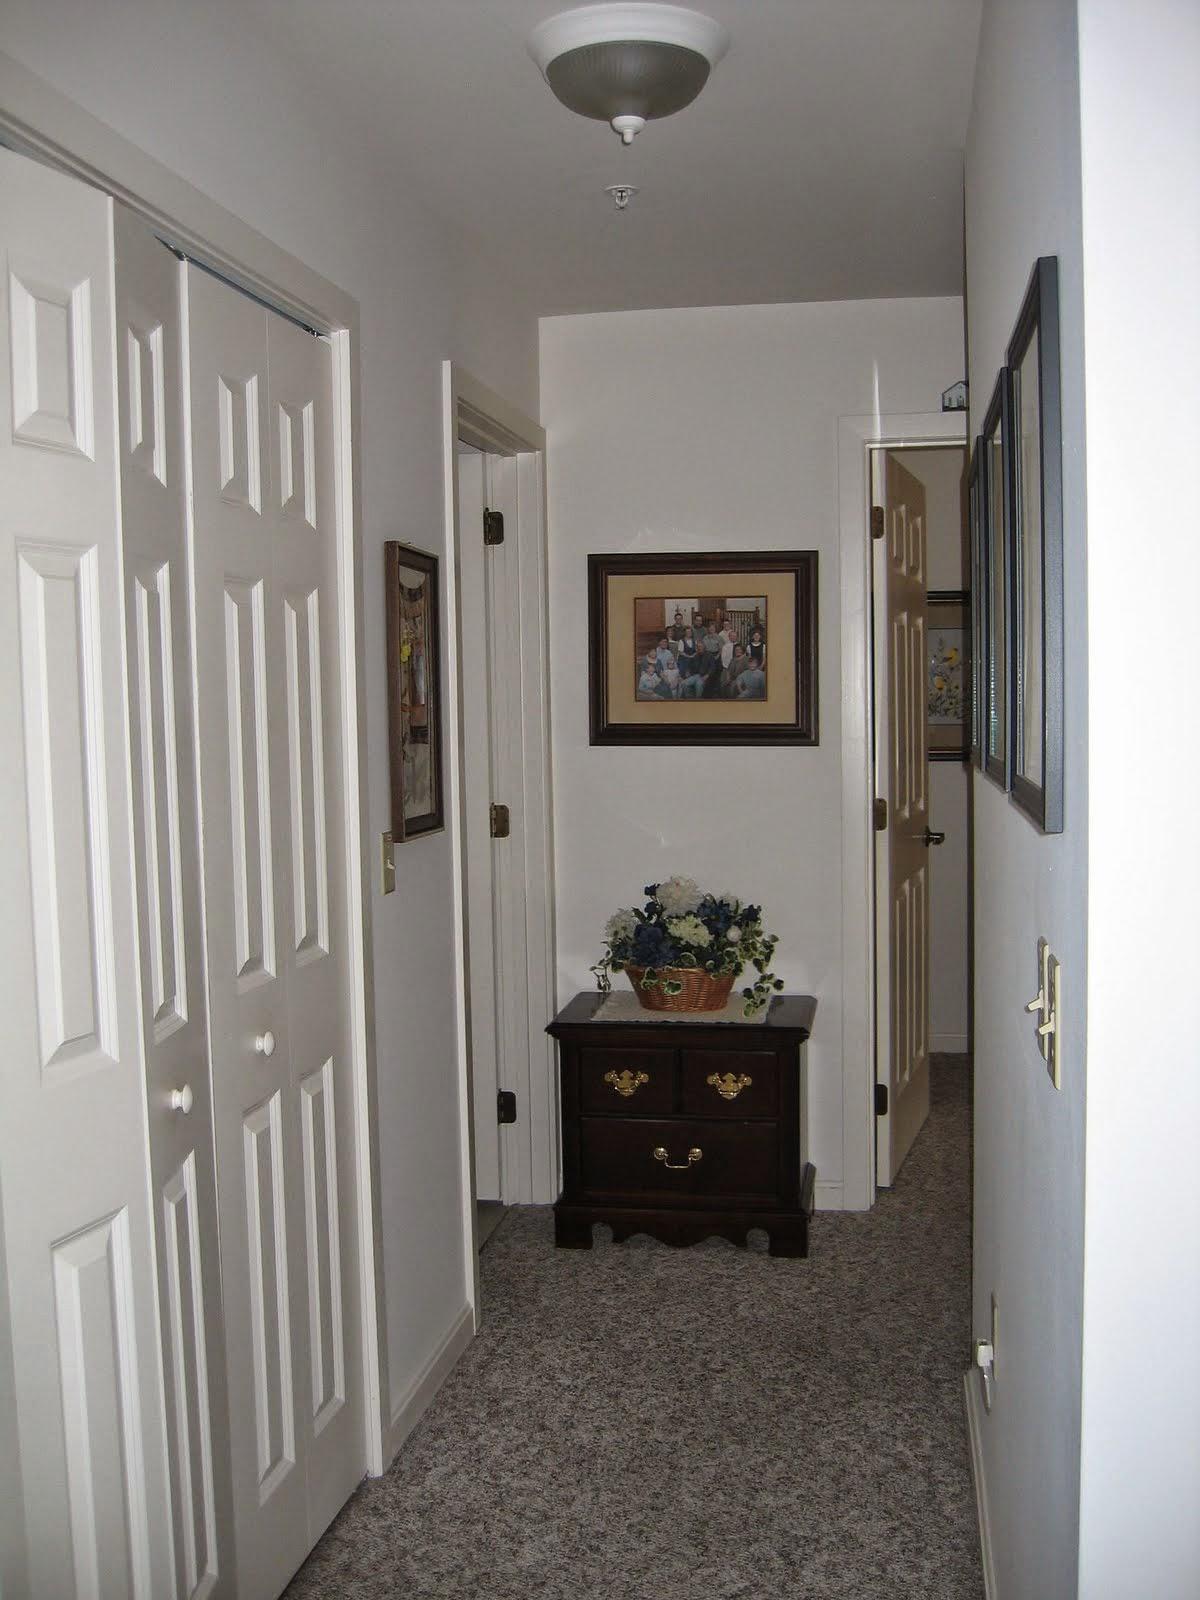 Crest View apartment hallway